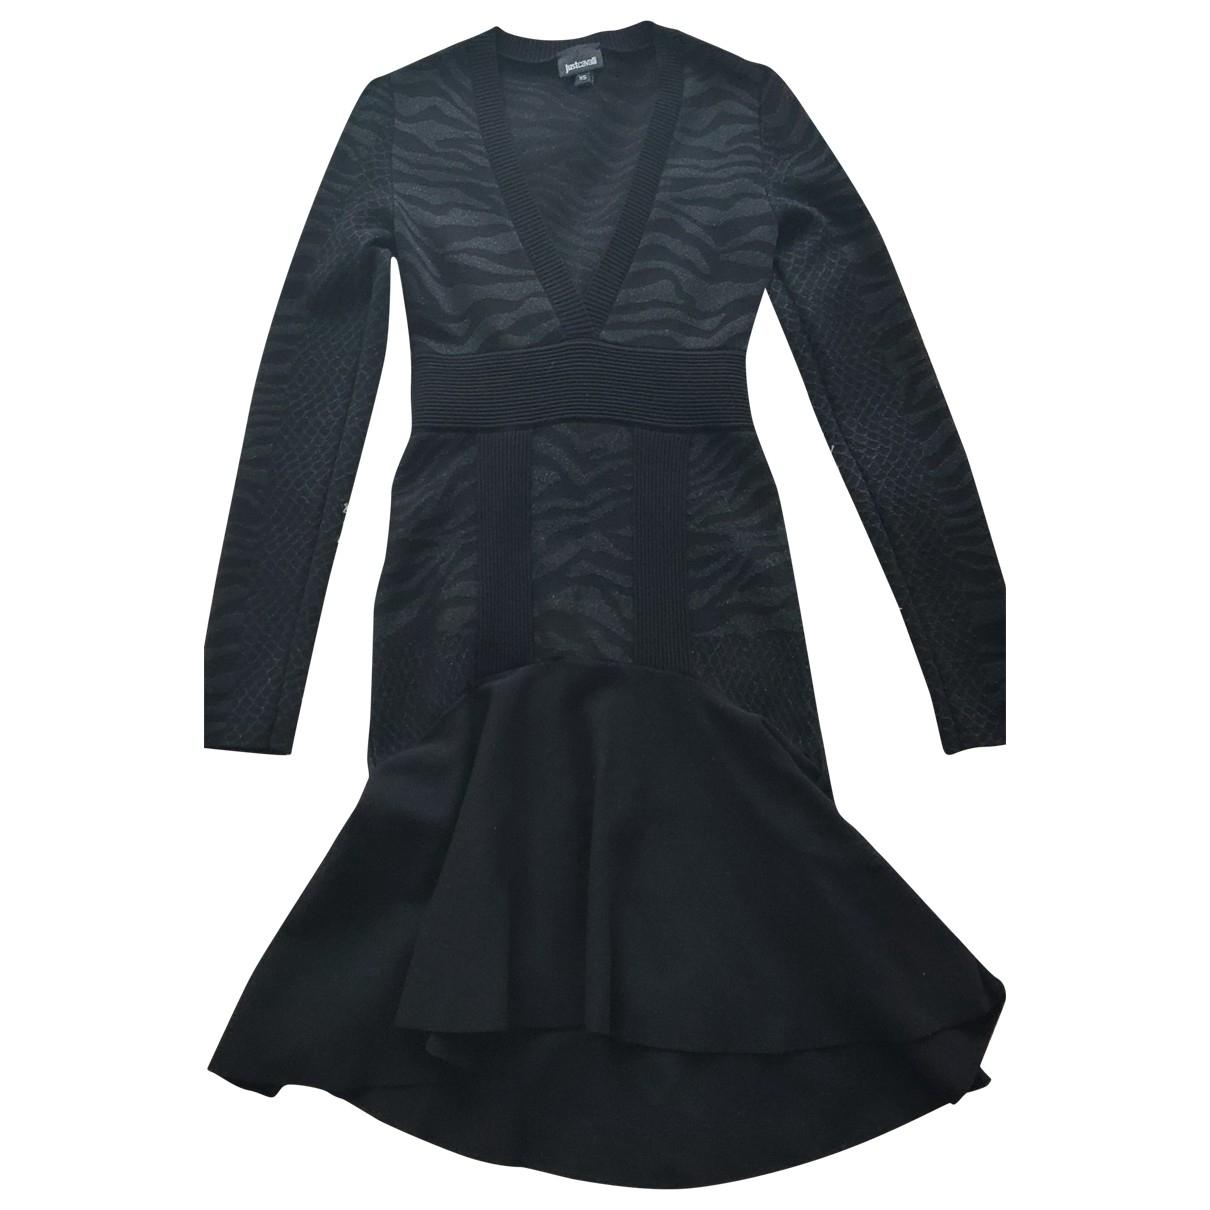 Just Cavalli \N Black Cotton - elasthane dress for Women 34 FR